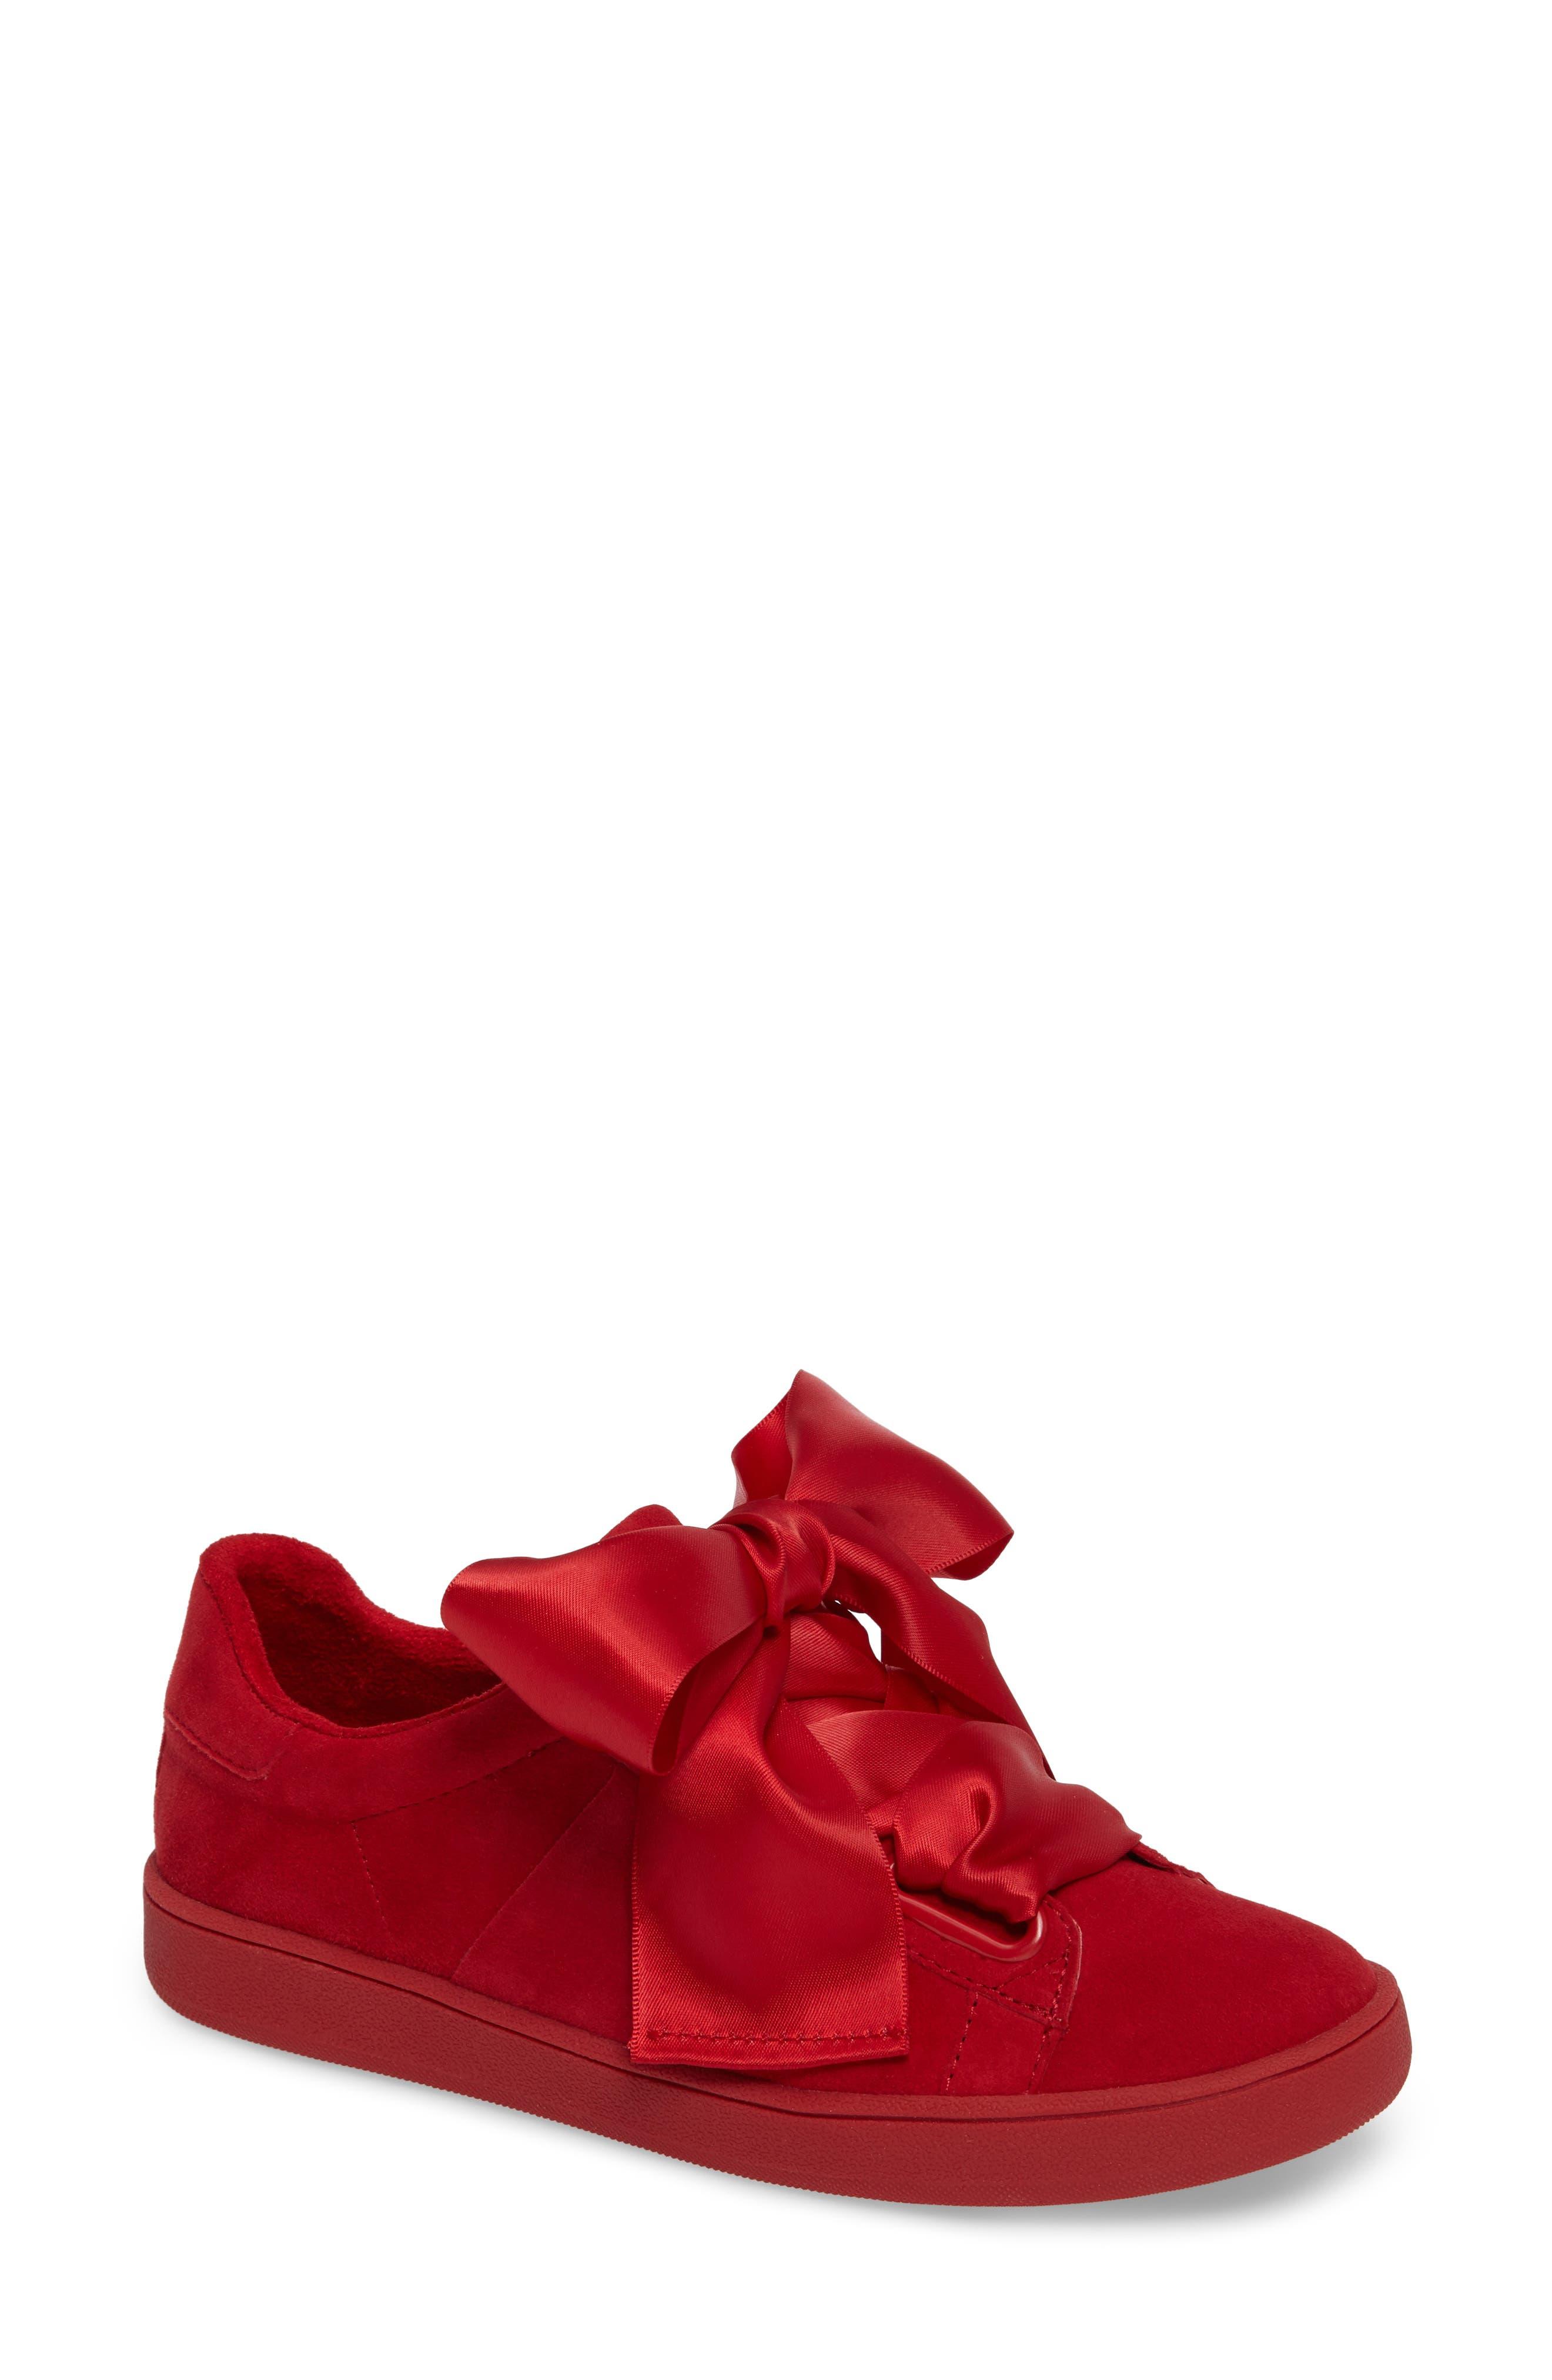 Pabst Low-Top Sneaker,                             Main thumbnail 7, color,